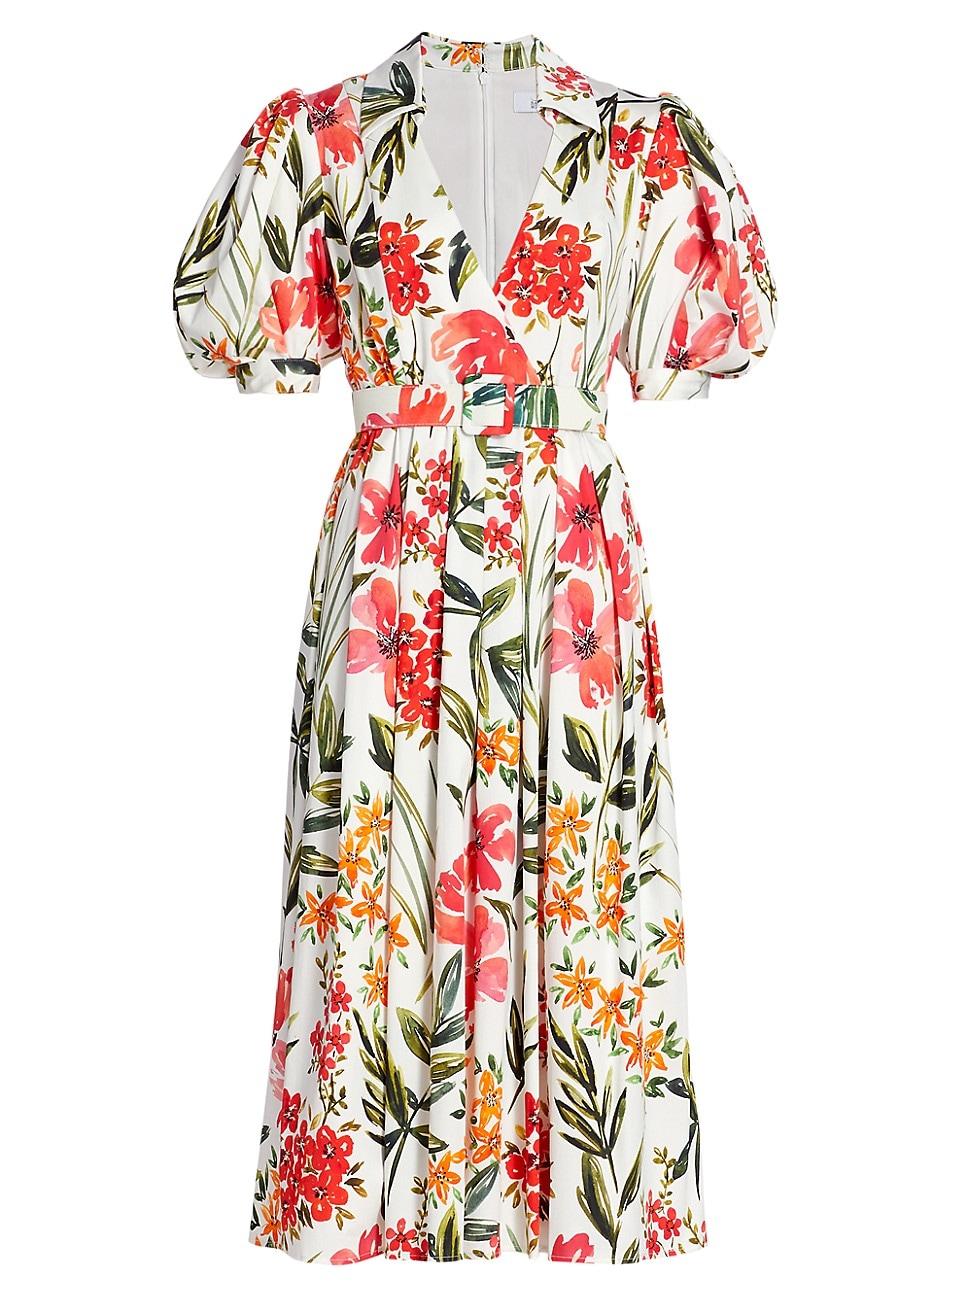 Badgley Mischka WOMEN'S FLORAL STRETCH-COTTON PUFF-SLEEVE DRESS